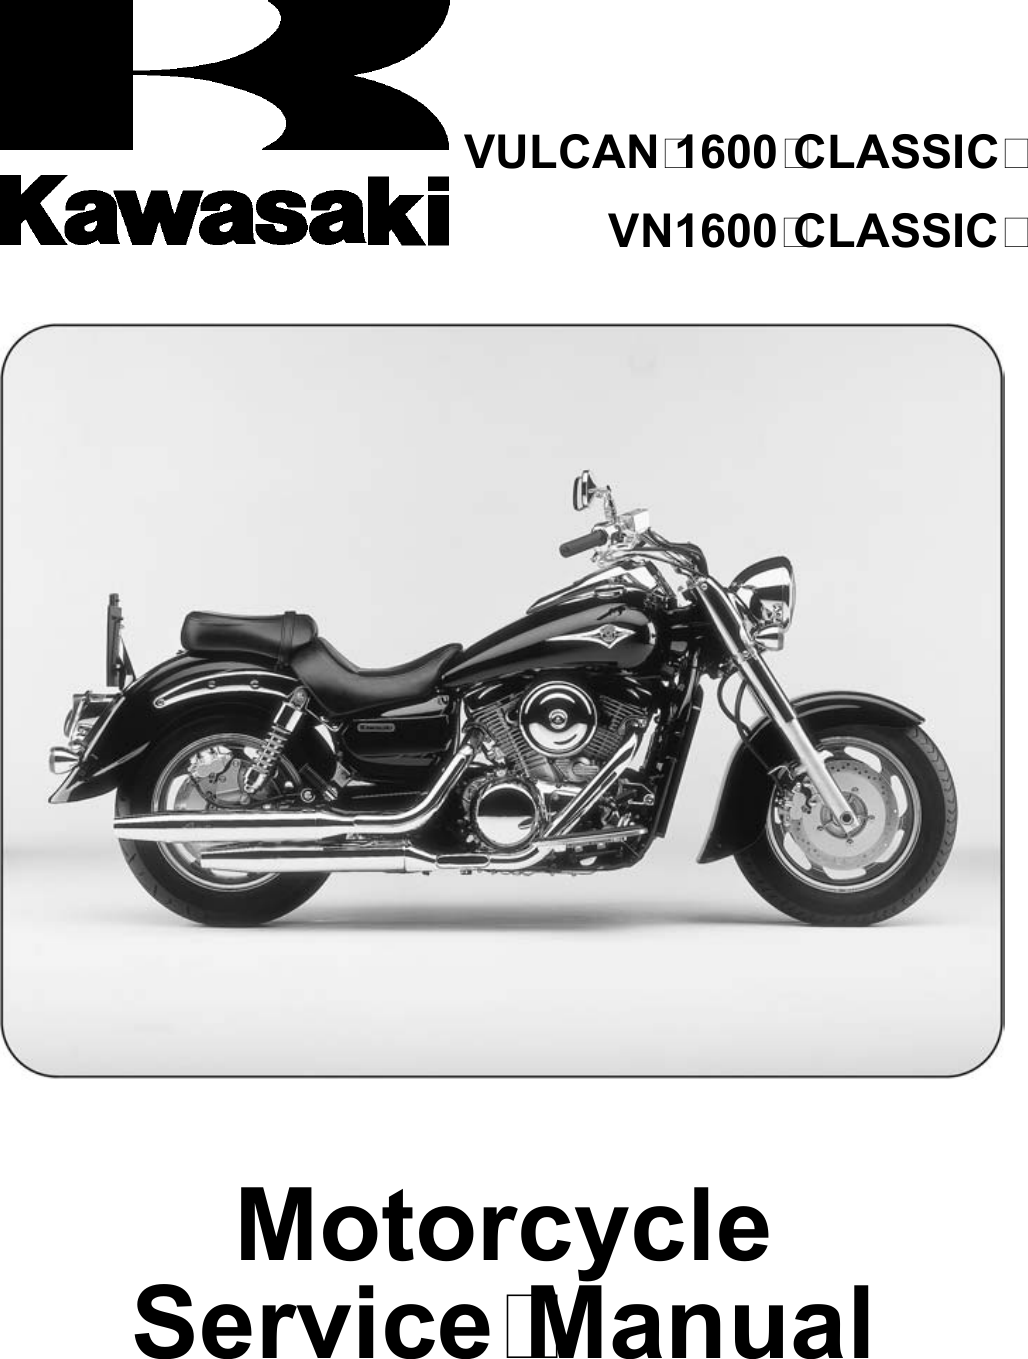 Kawasaki Vulcan 1600 Classic Service Manual Manualslib Makes It Easy Fuel Filter To Find Manuals Online